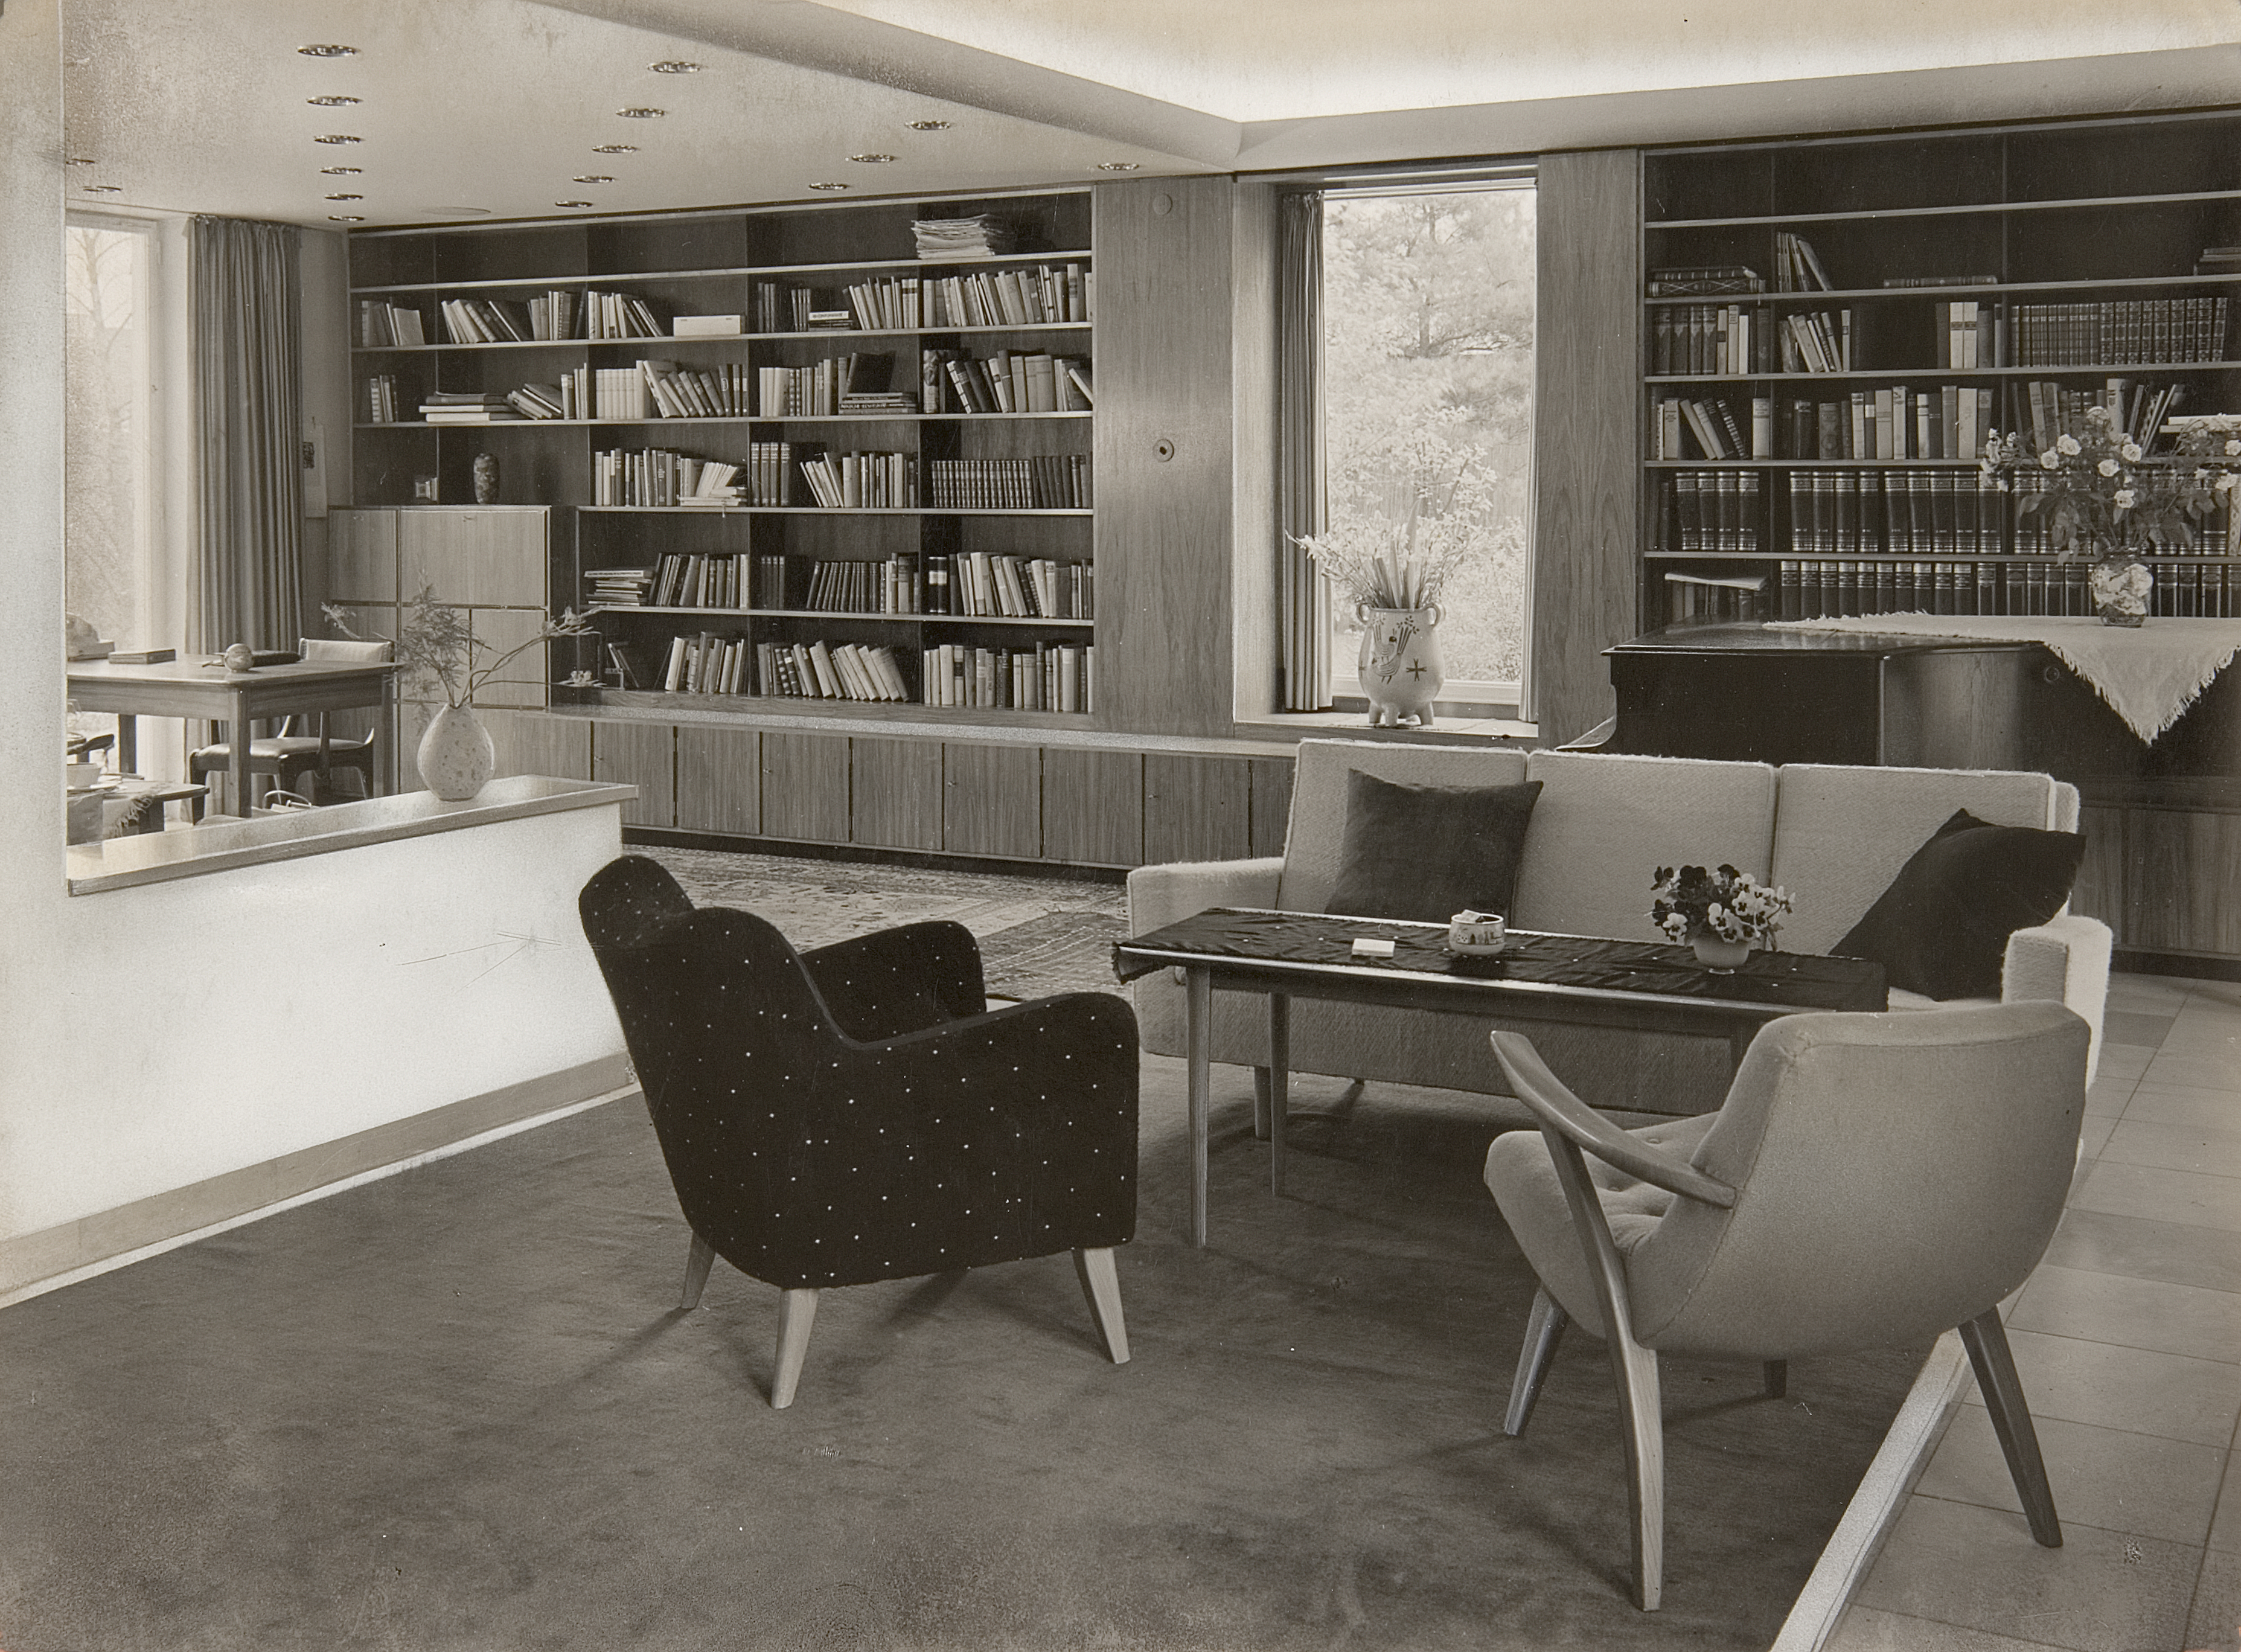 Bilddatei: Bibliothek Foto Paatsch-Renger.jpg